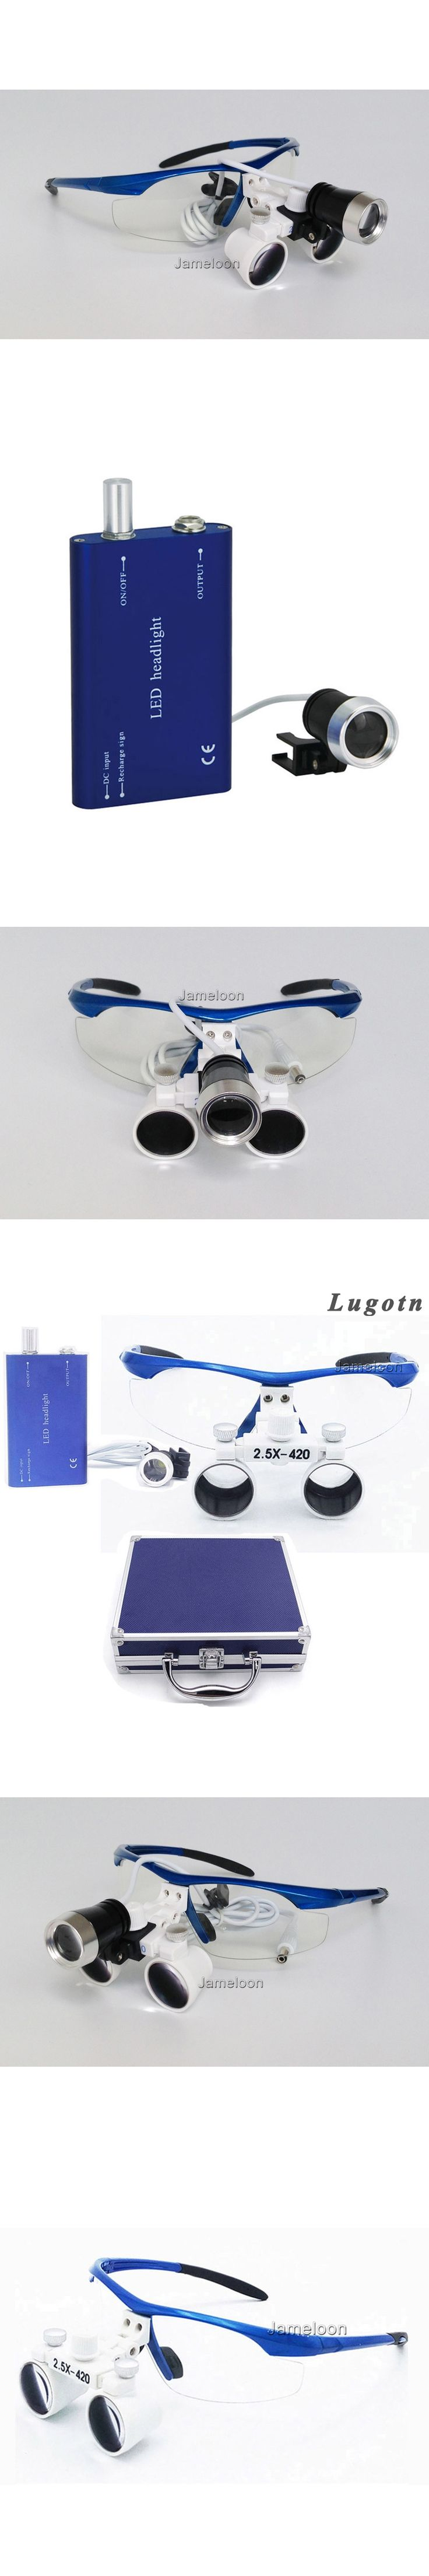 Metal box 2.5X enlarging surgical magnifying led head light ENT loupe dental operation ear doctor magnifier lens